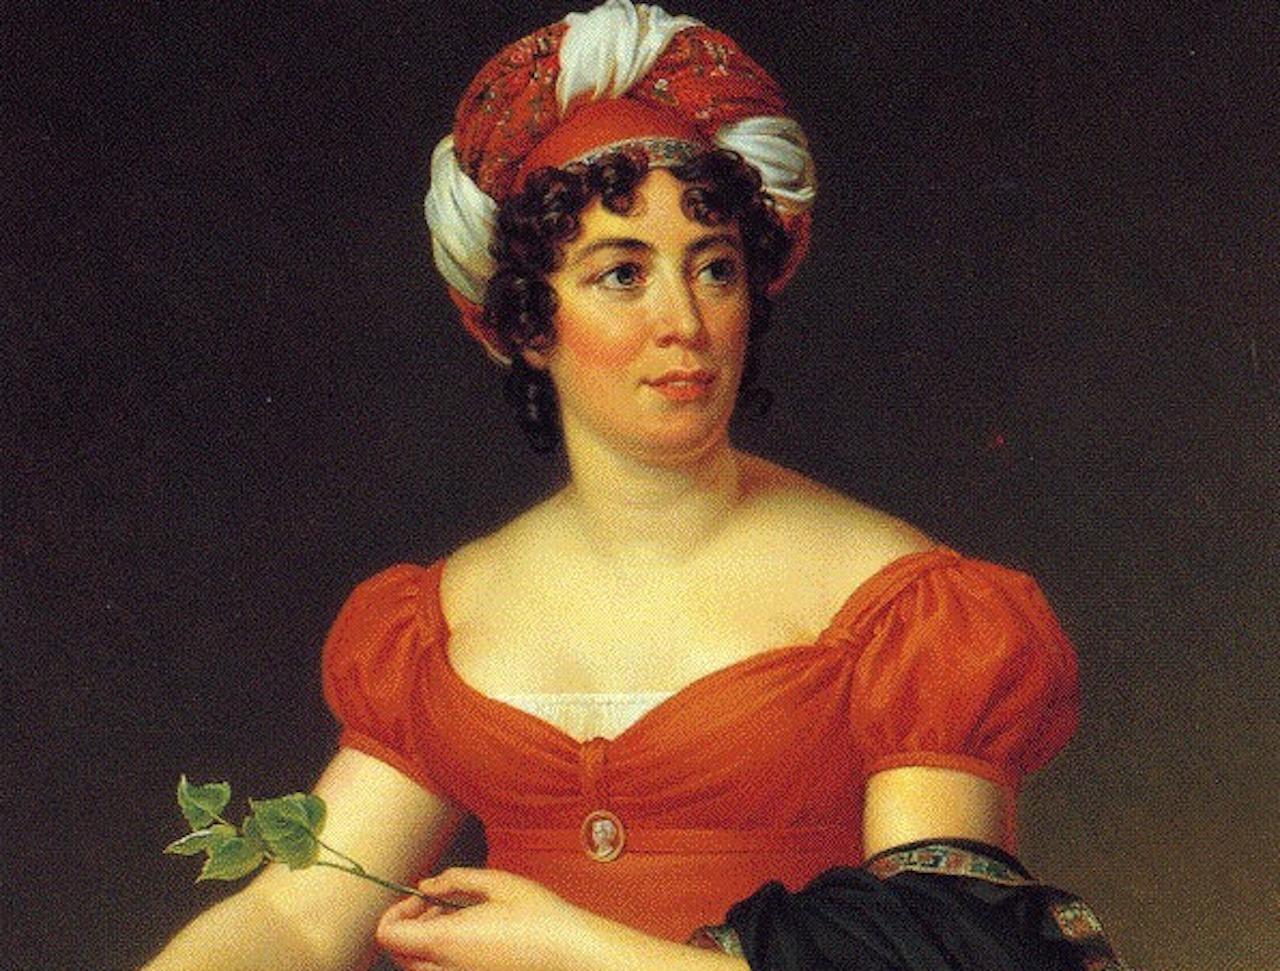 Chi era Madame de Staël